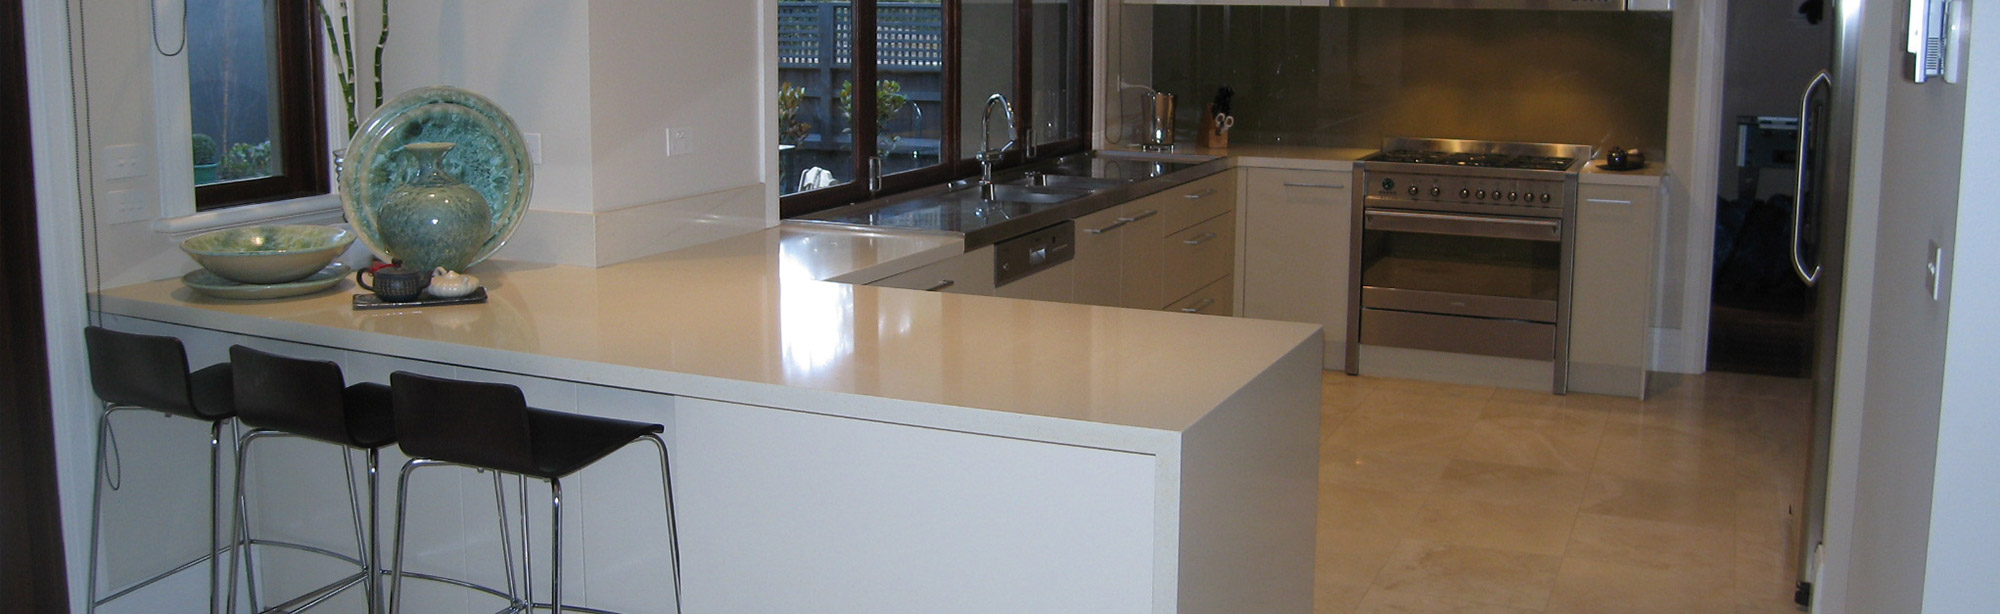 Kitchen designers melbourne kitchens melbourne kitchens squared solutioingenieria Choice Image